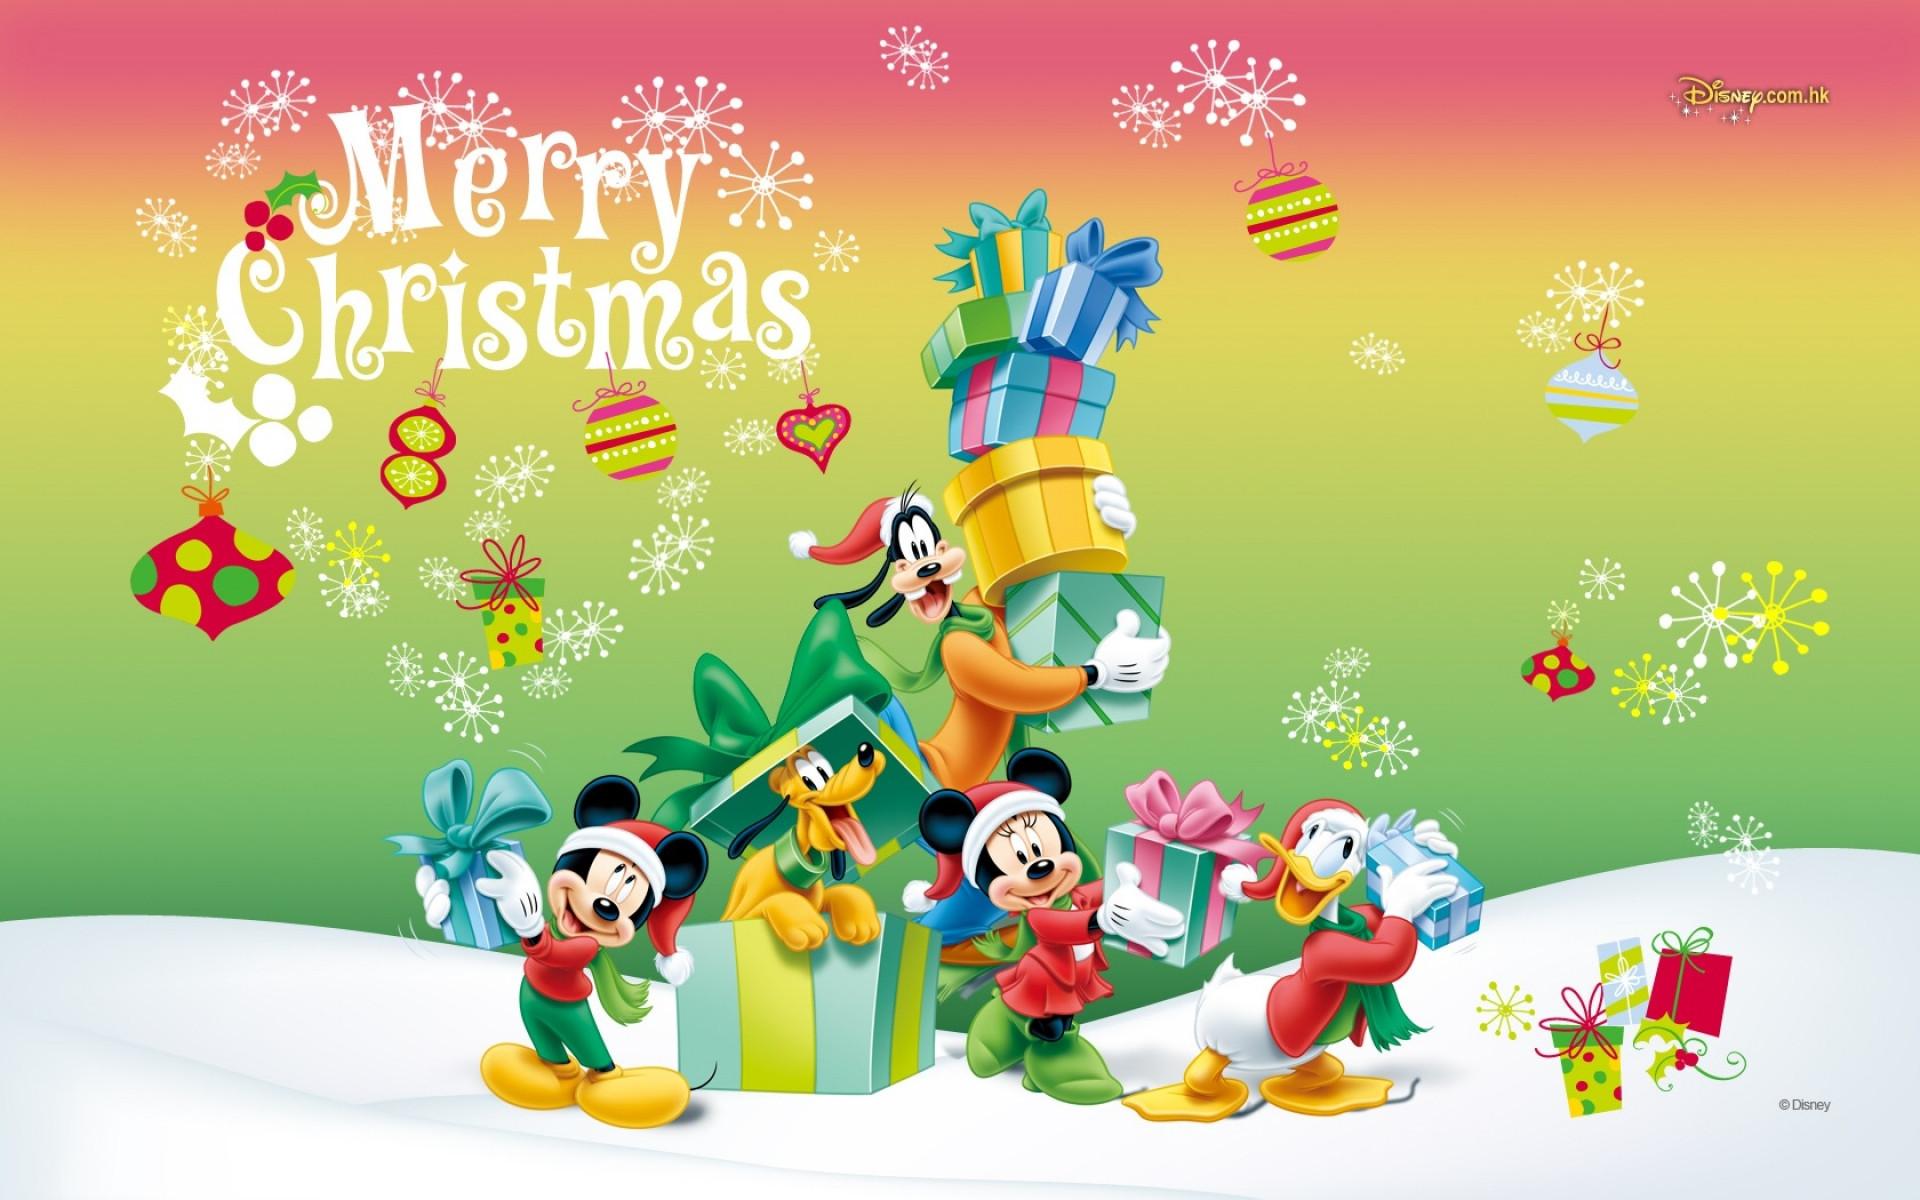 1920x1080 Animated Christmas Desktop Widescreen HD Wallpaper